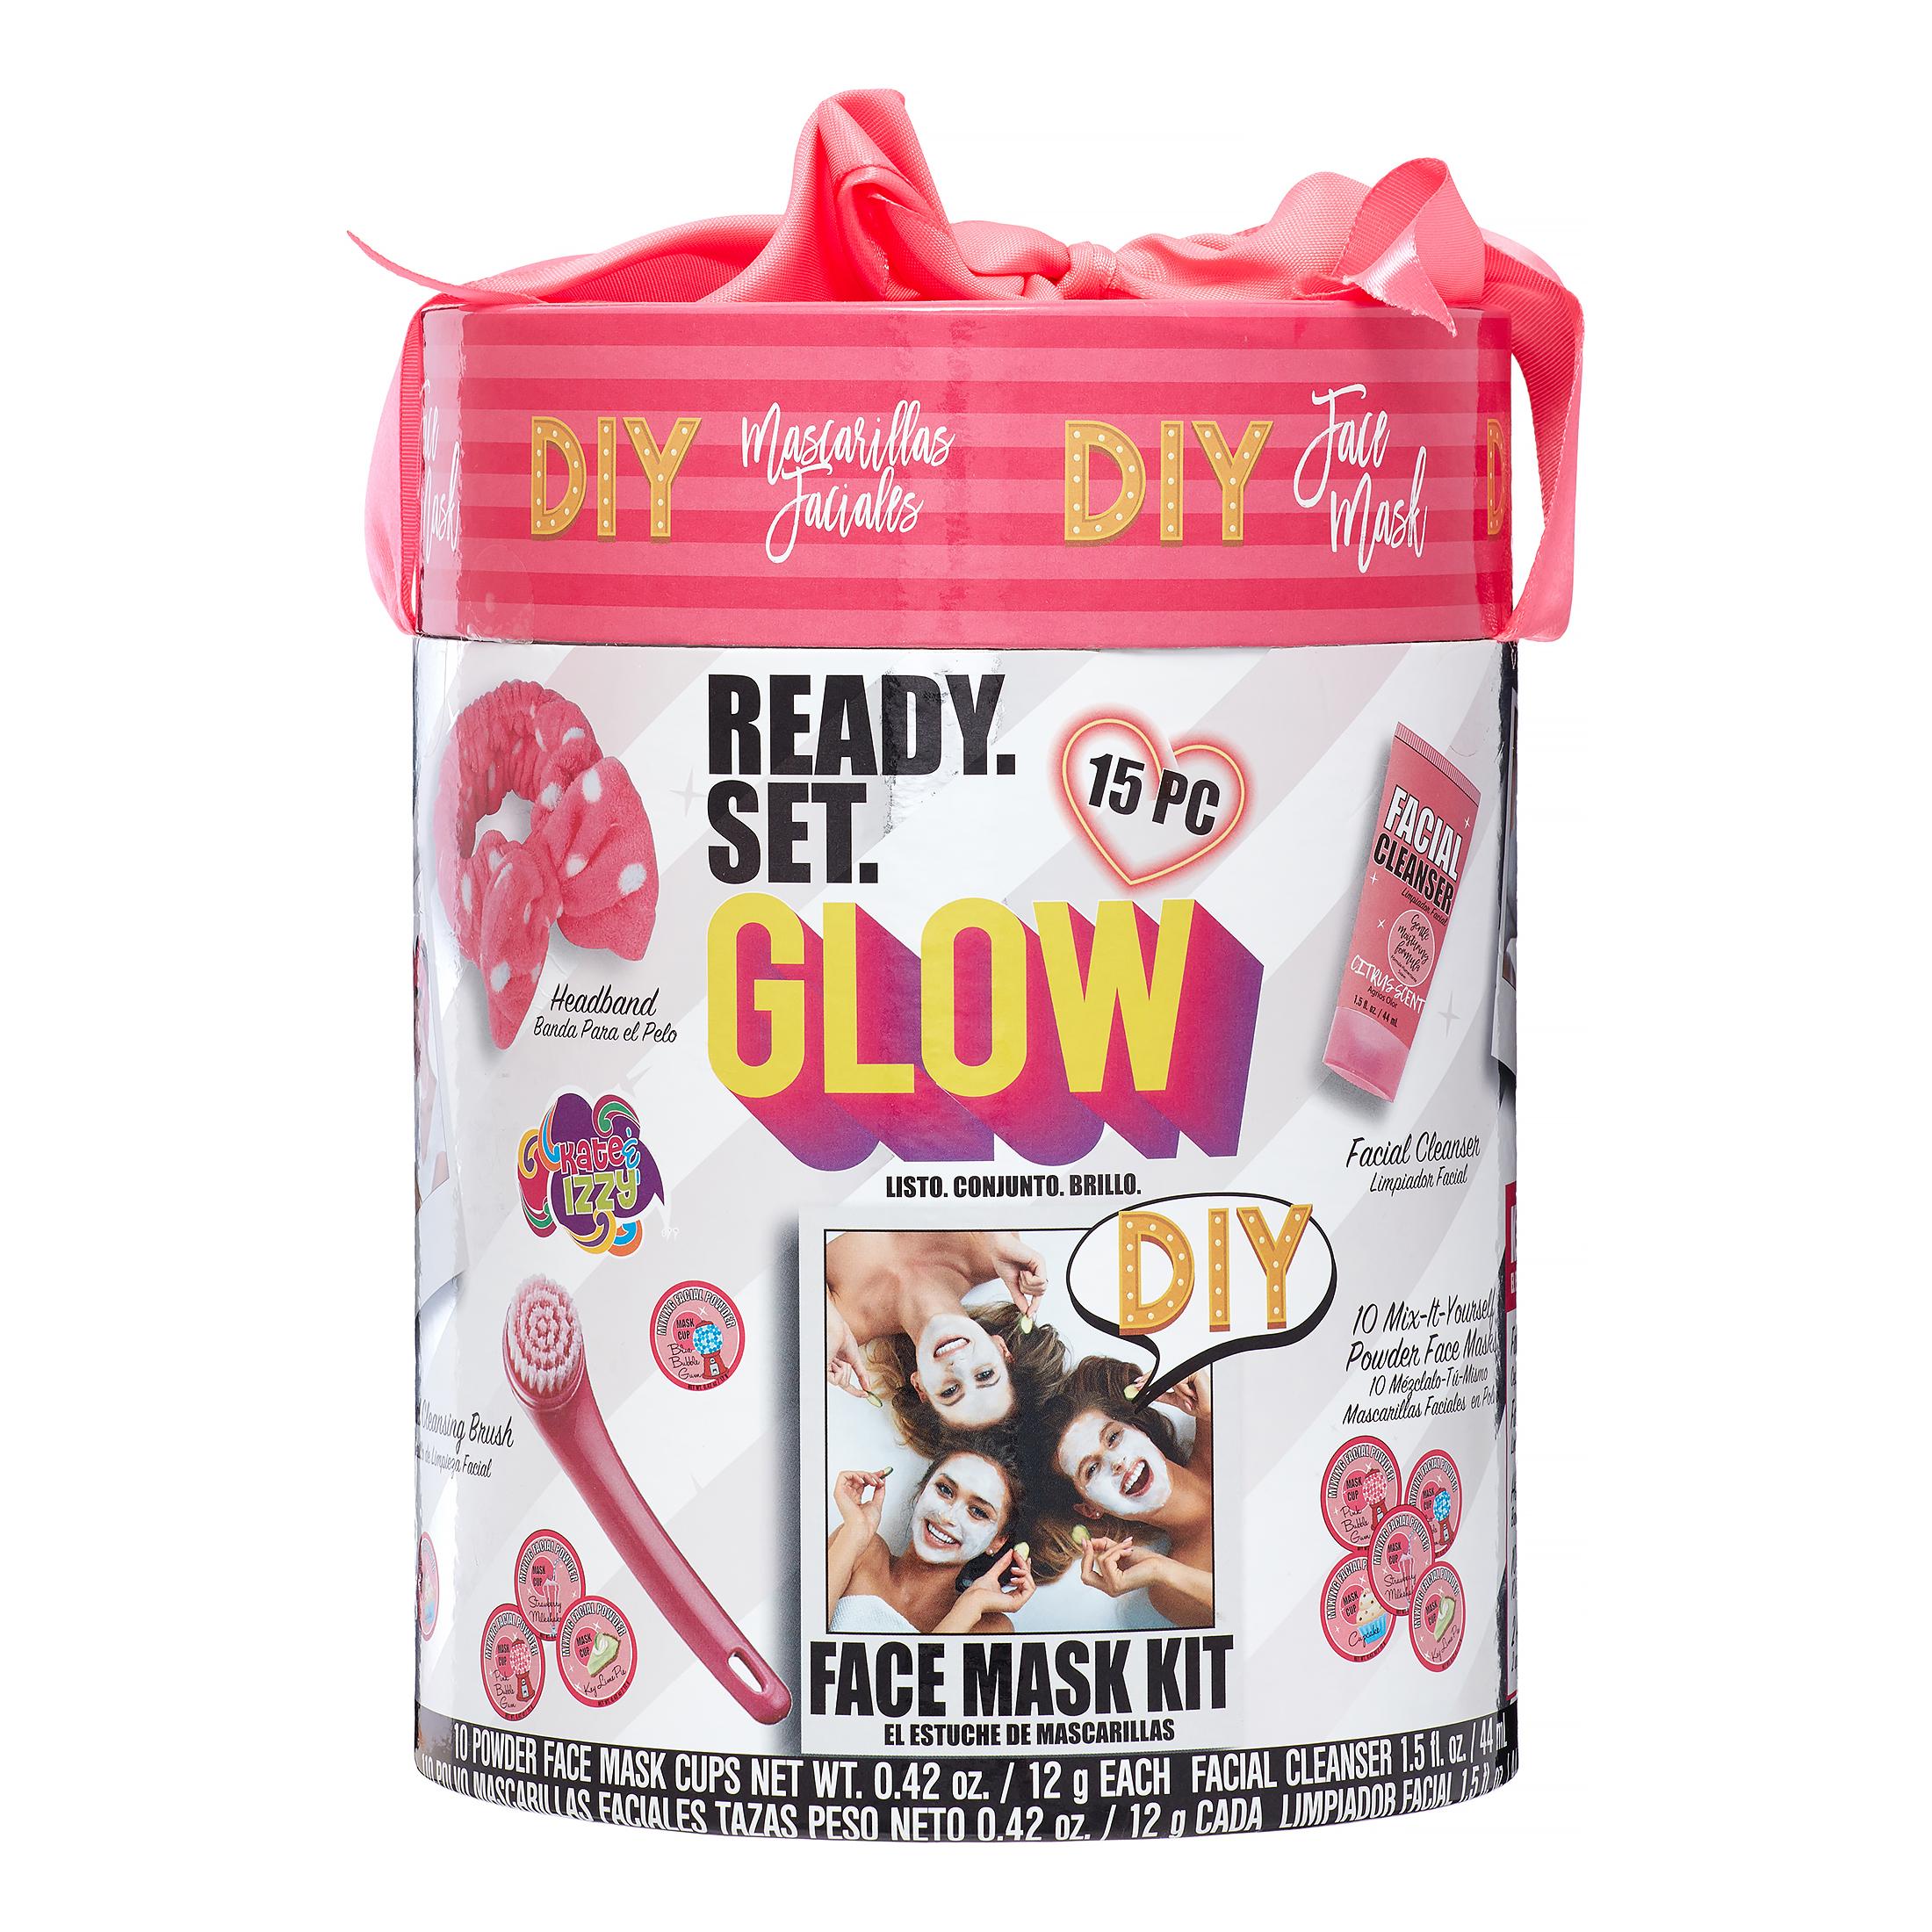 15-Piece Onyx Professional Ready. Set. Glow. DIY Face Mask Gift Set